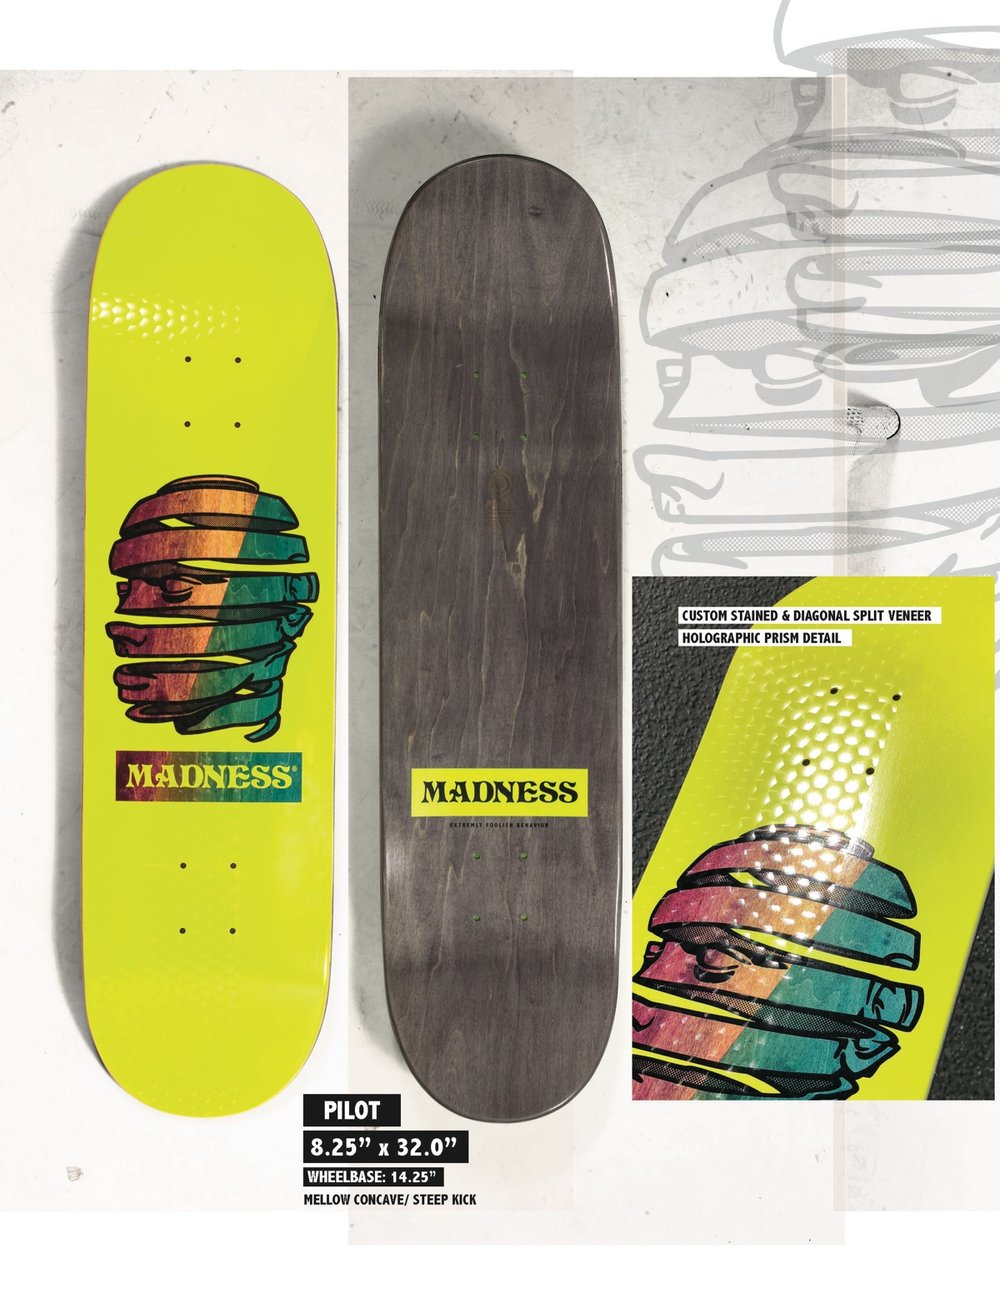 Copy of MADNESS Pilot 8.25 R7 Skateboard Deck